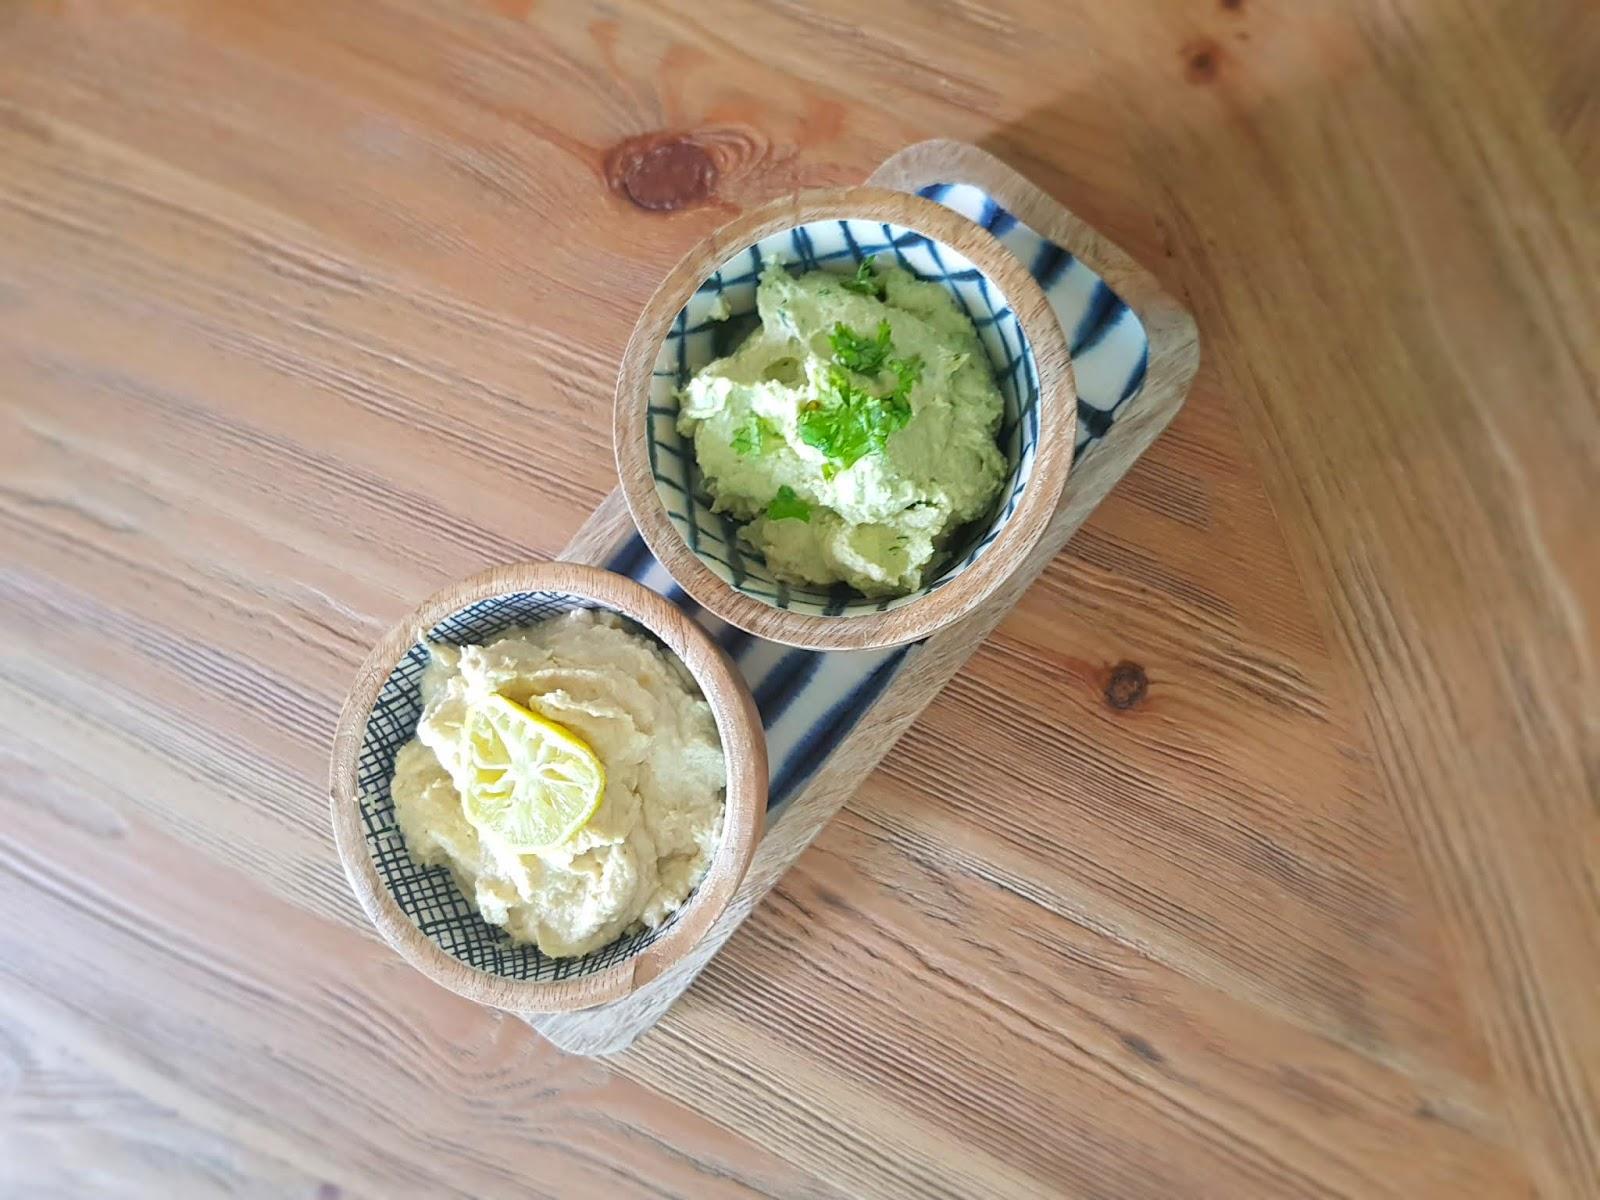 Vegan quinoa cutlet with hummus - High protein lunch - vegan protein recipe